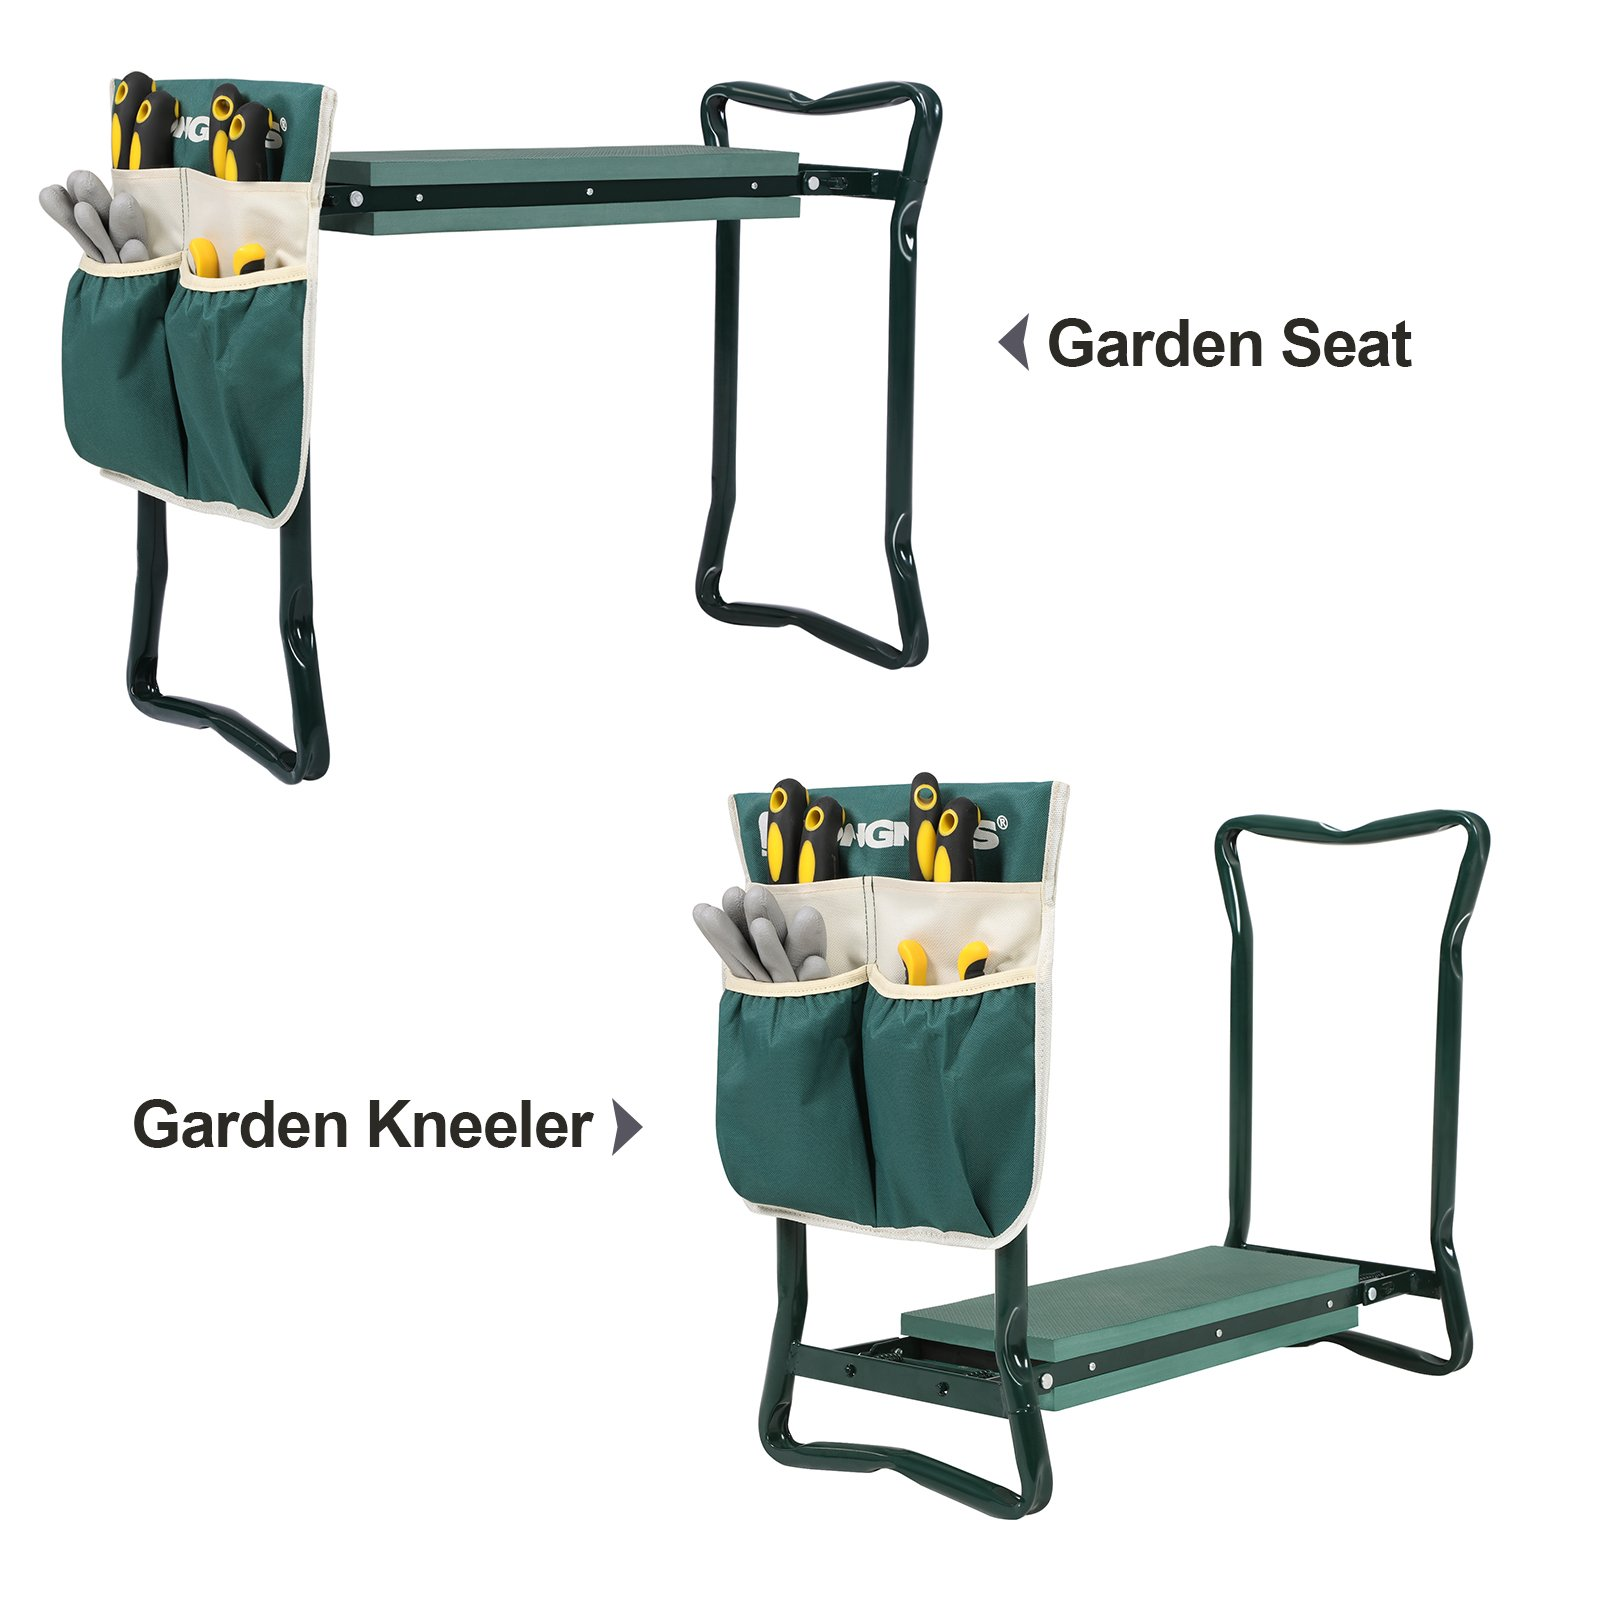 Galleon Songmics Garden Kneeler Seat With Upgraded Large